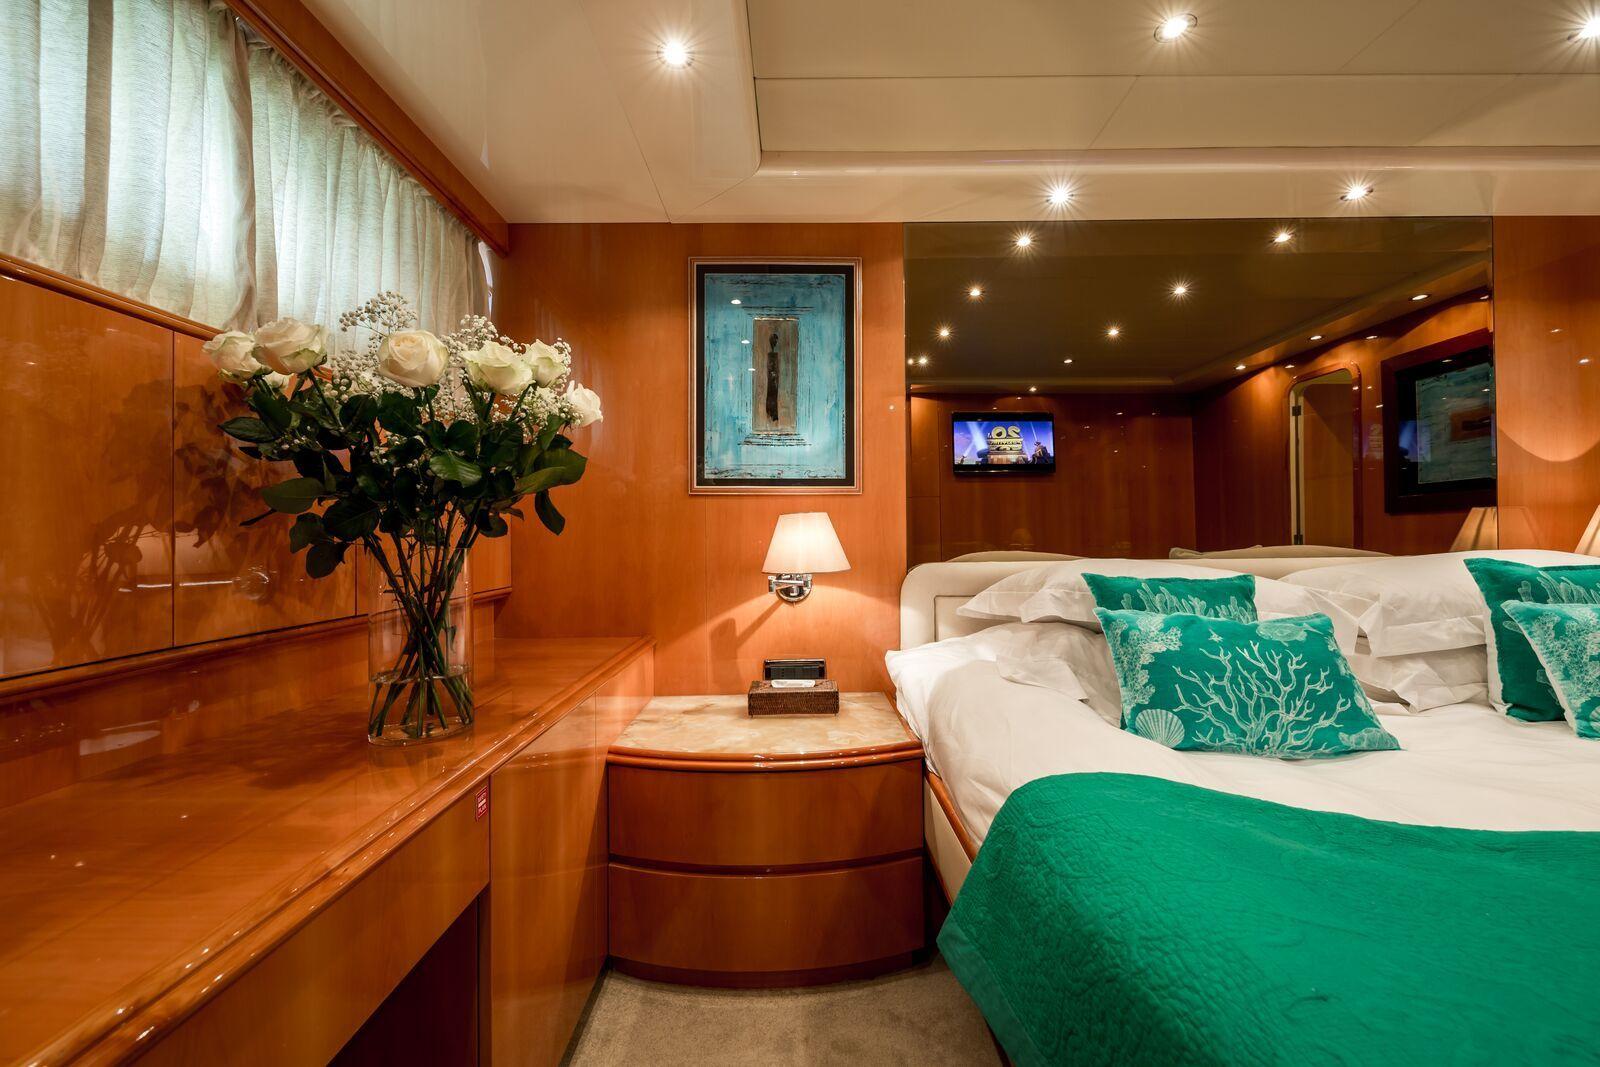 INDULGENCE OF POOLE Mangusta 86 Luxury Superyacht VIP Cabin